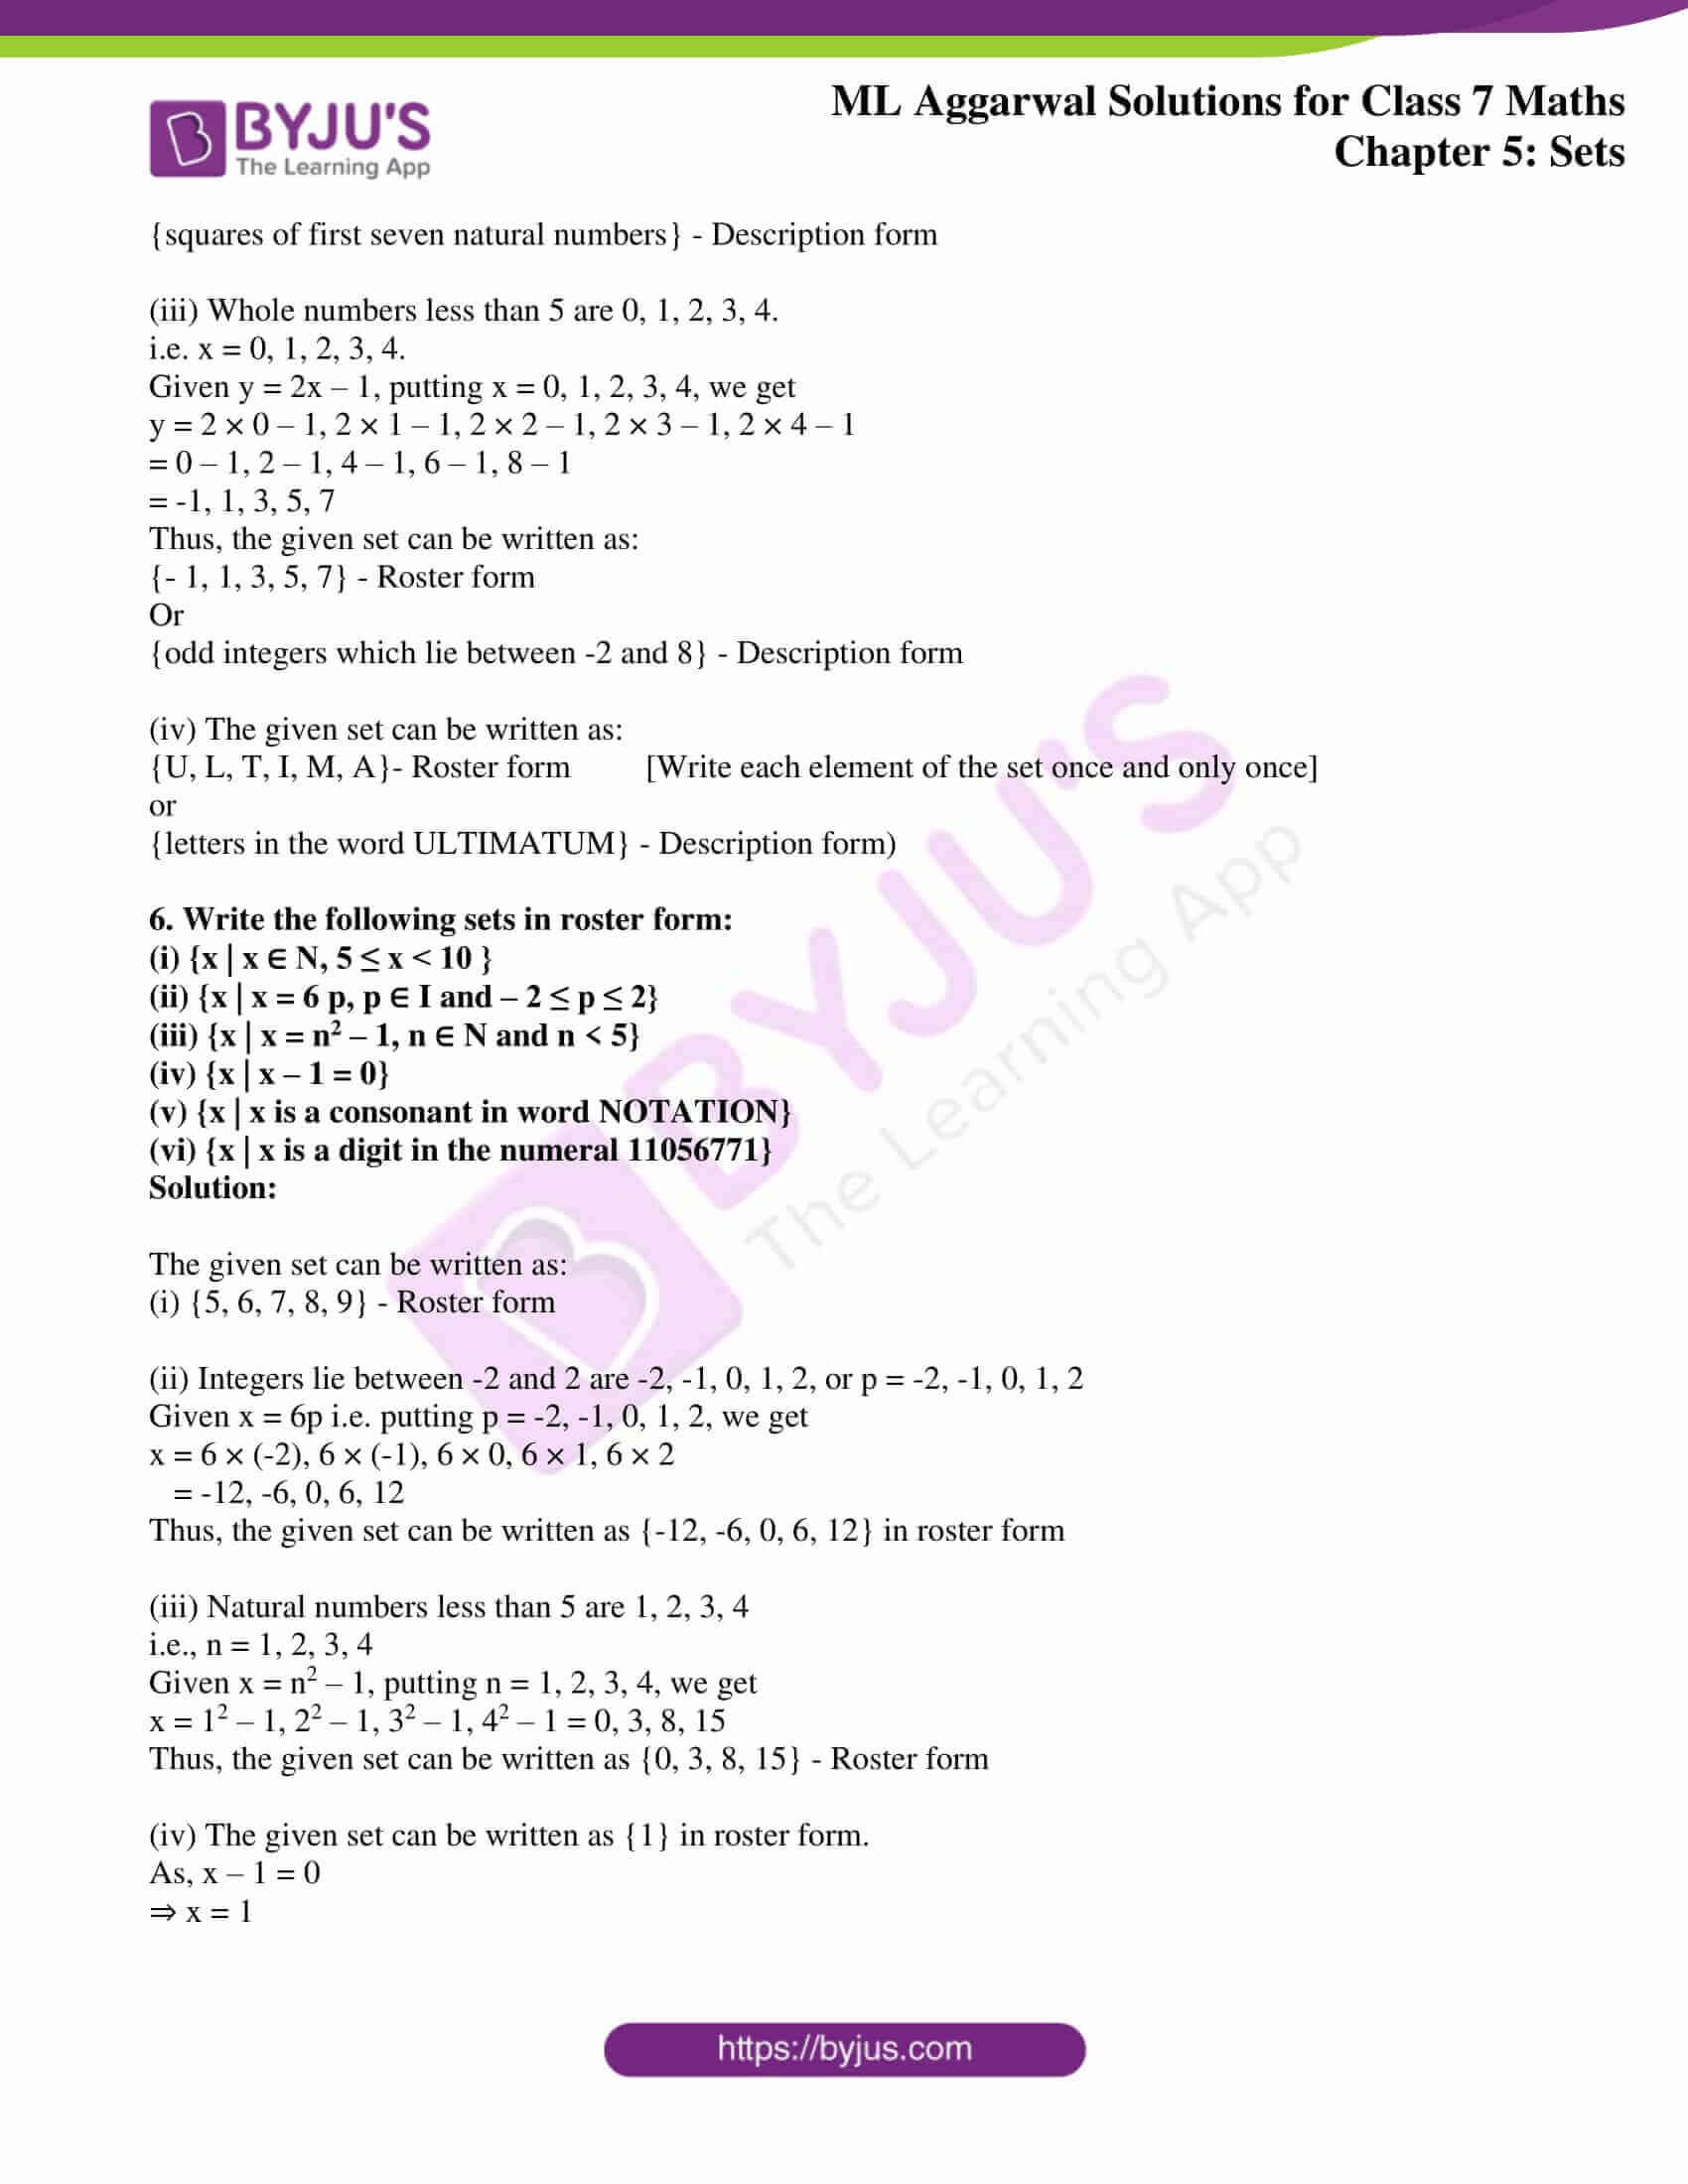 ml aggarwal sol class 7 maths chapter 5 3